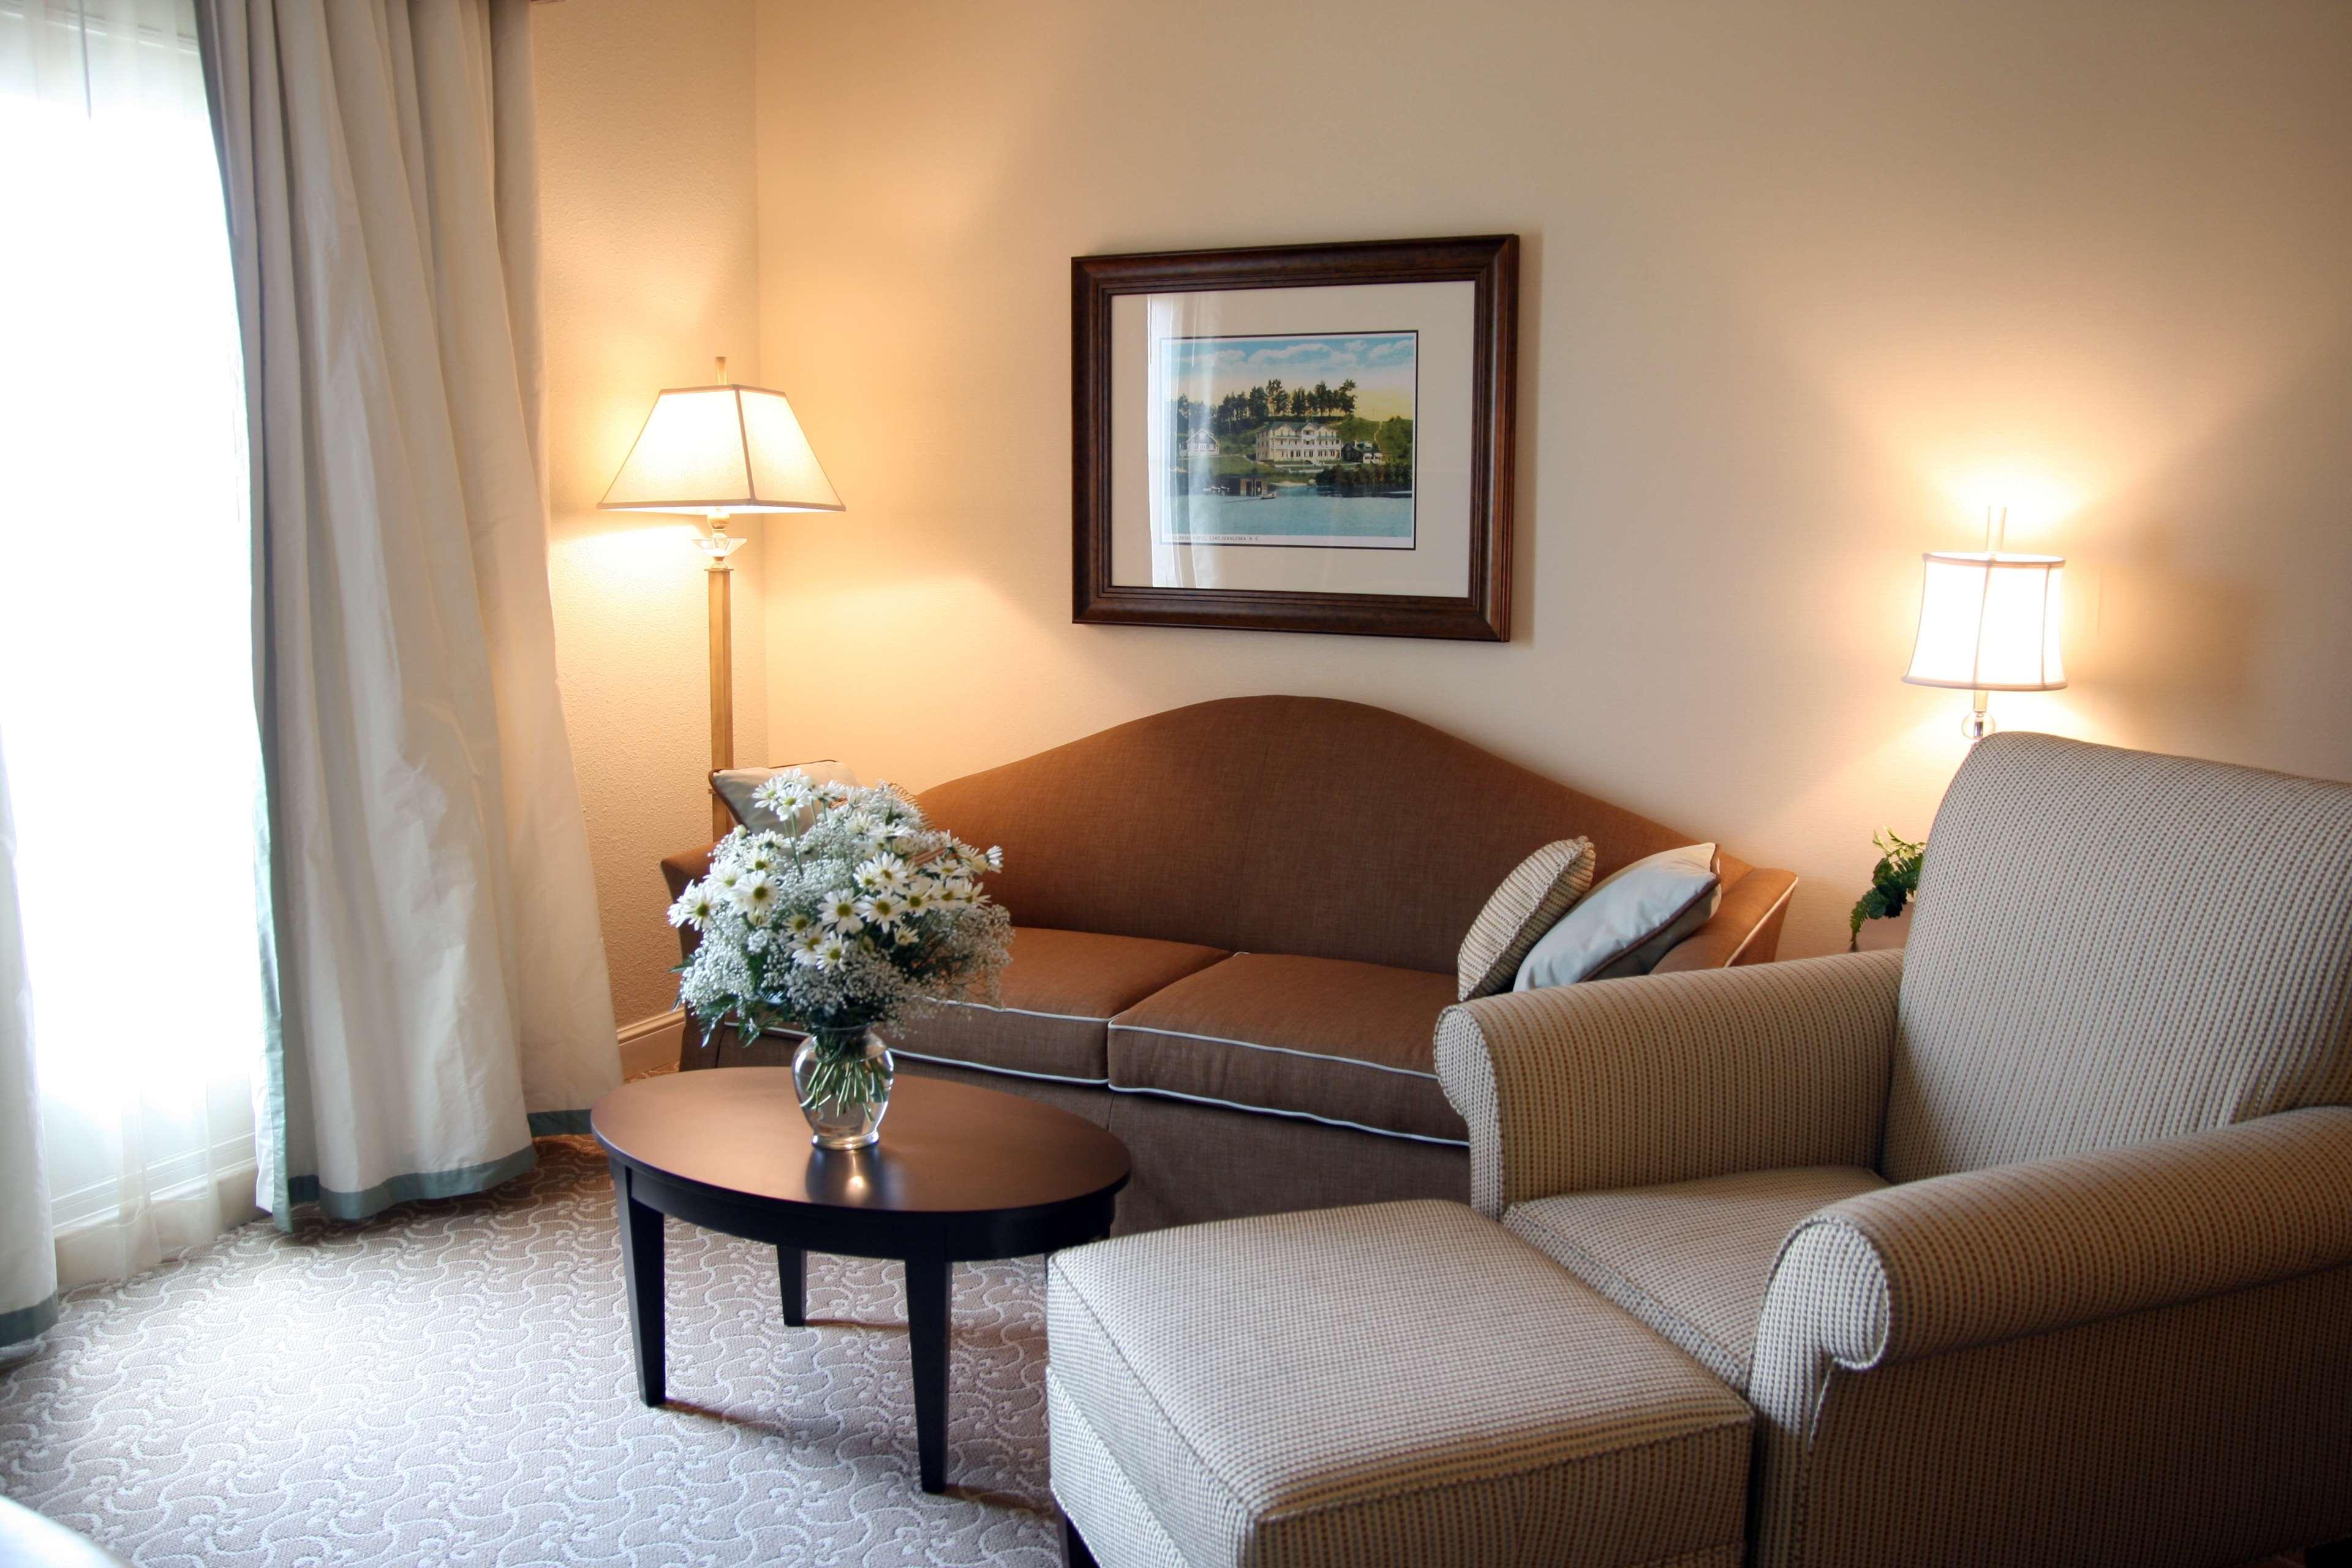 Hampton Inn & Suites Charlotte/South Park at Phillips Place image 17